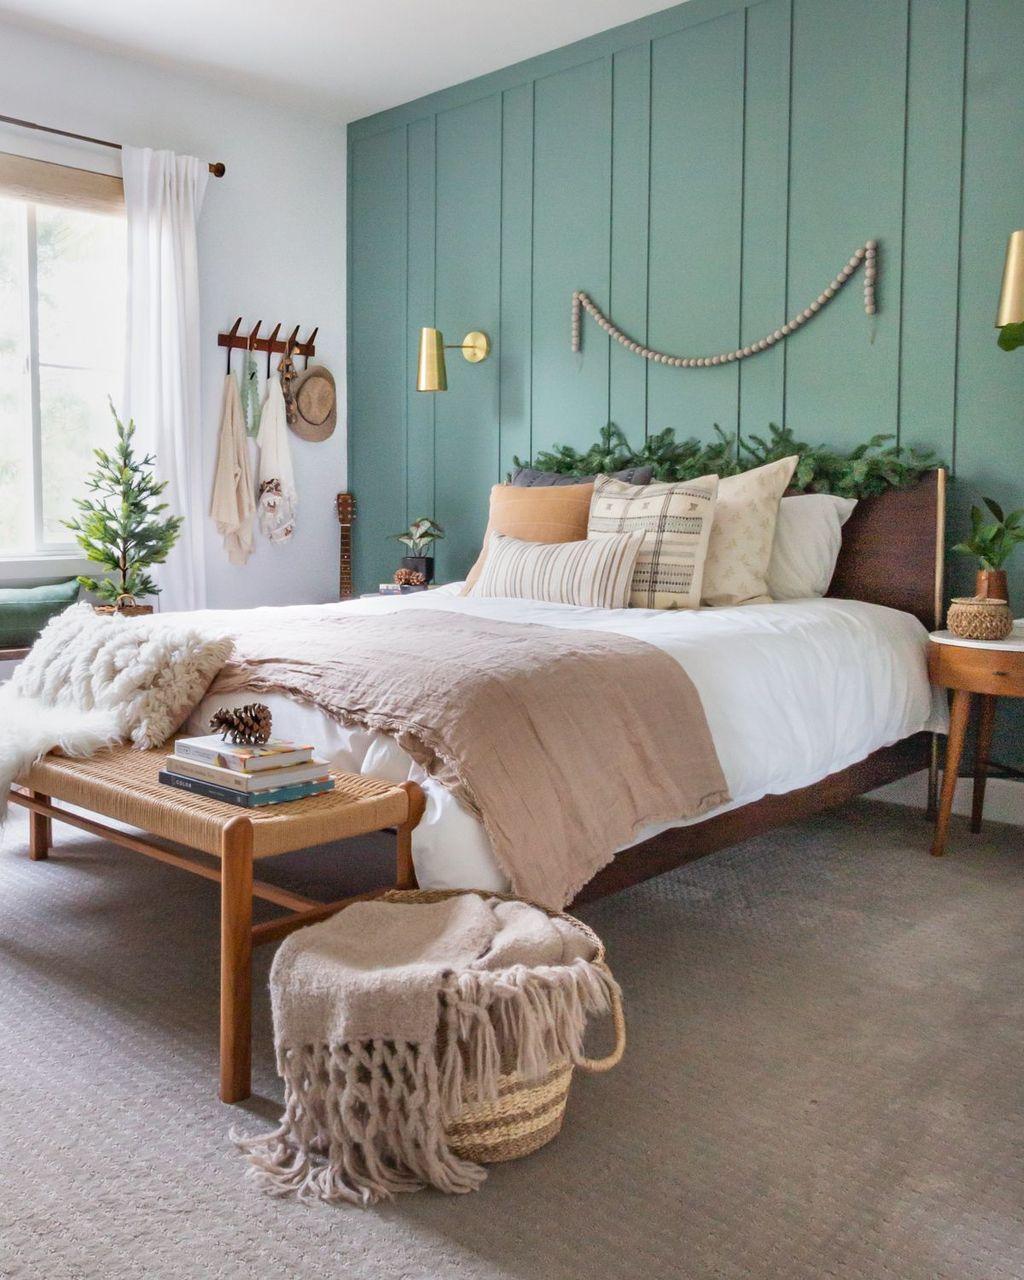 Awesome Boho Chic Bedroom Decor Ideas 30